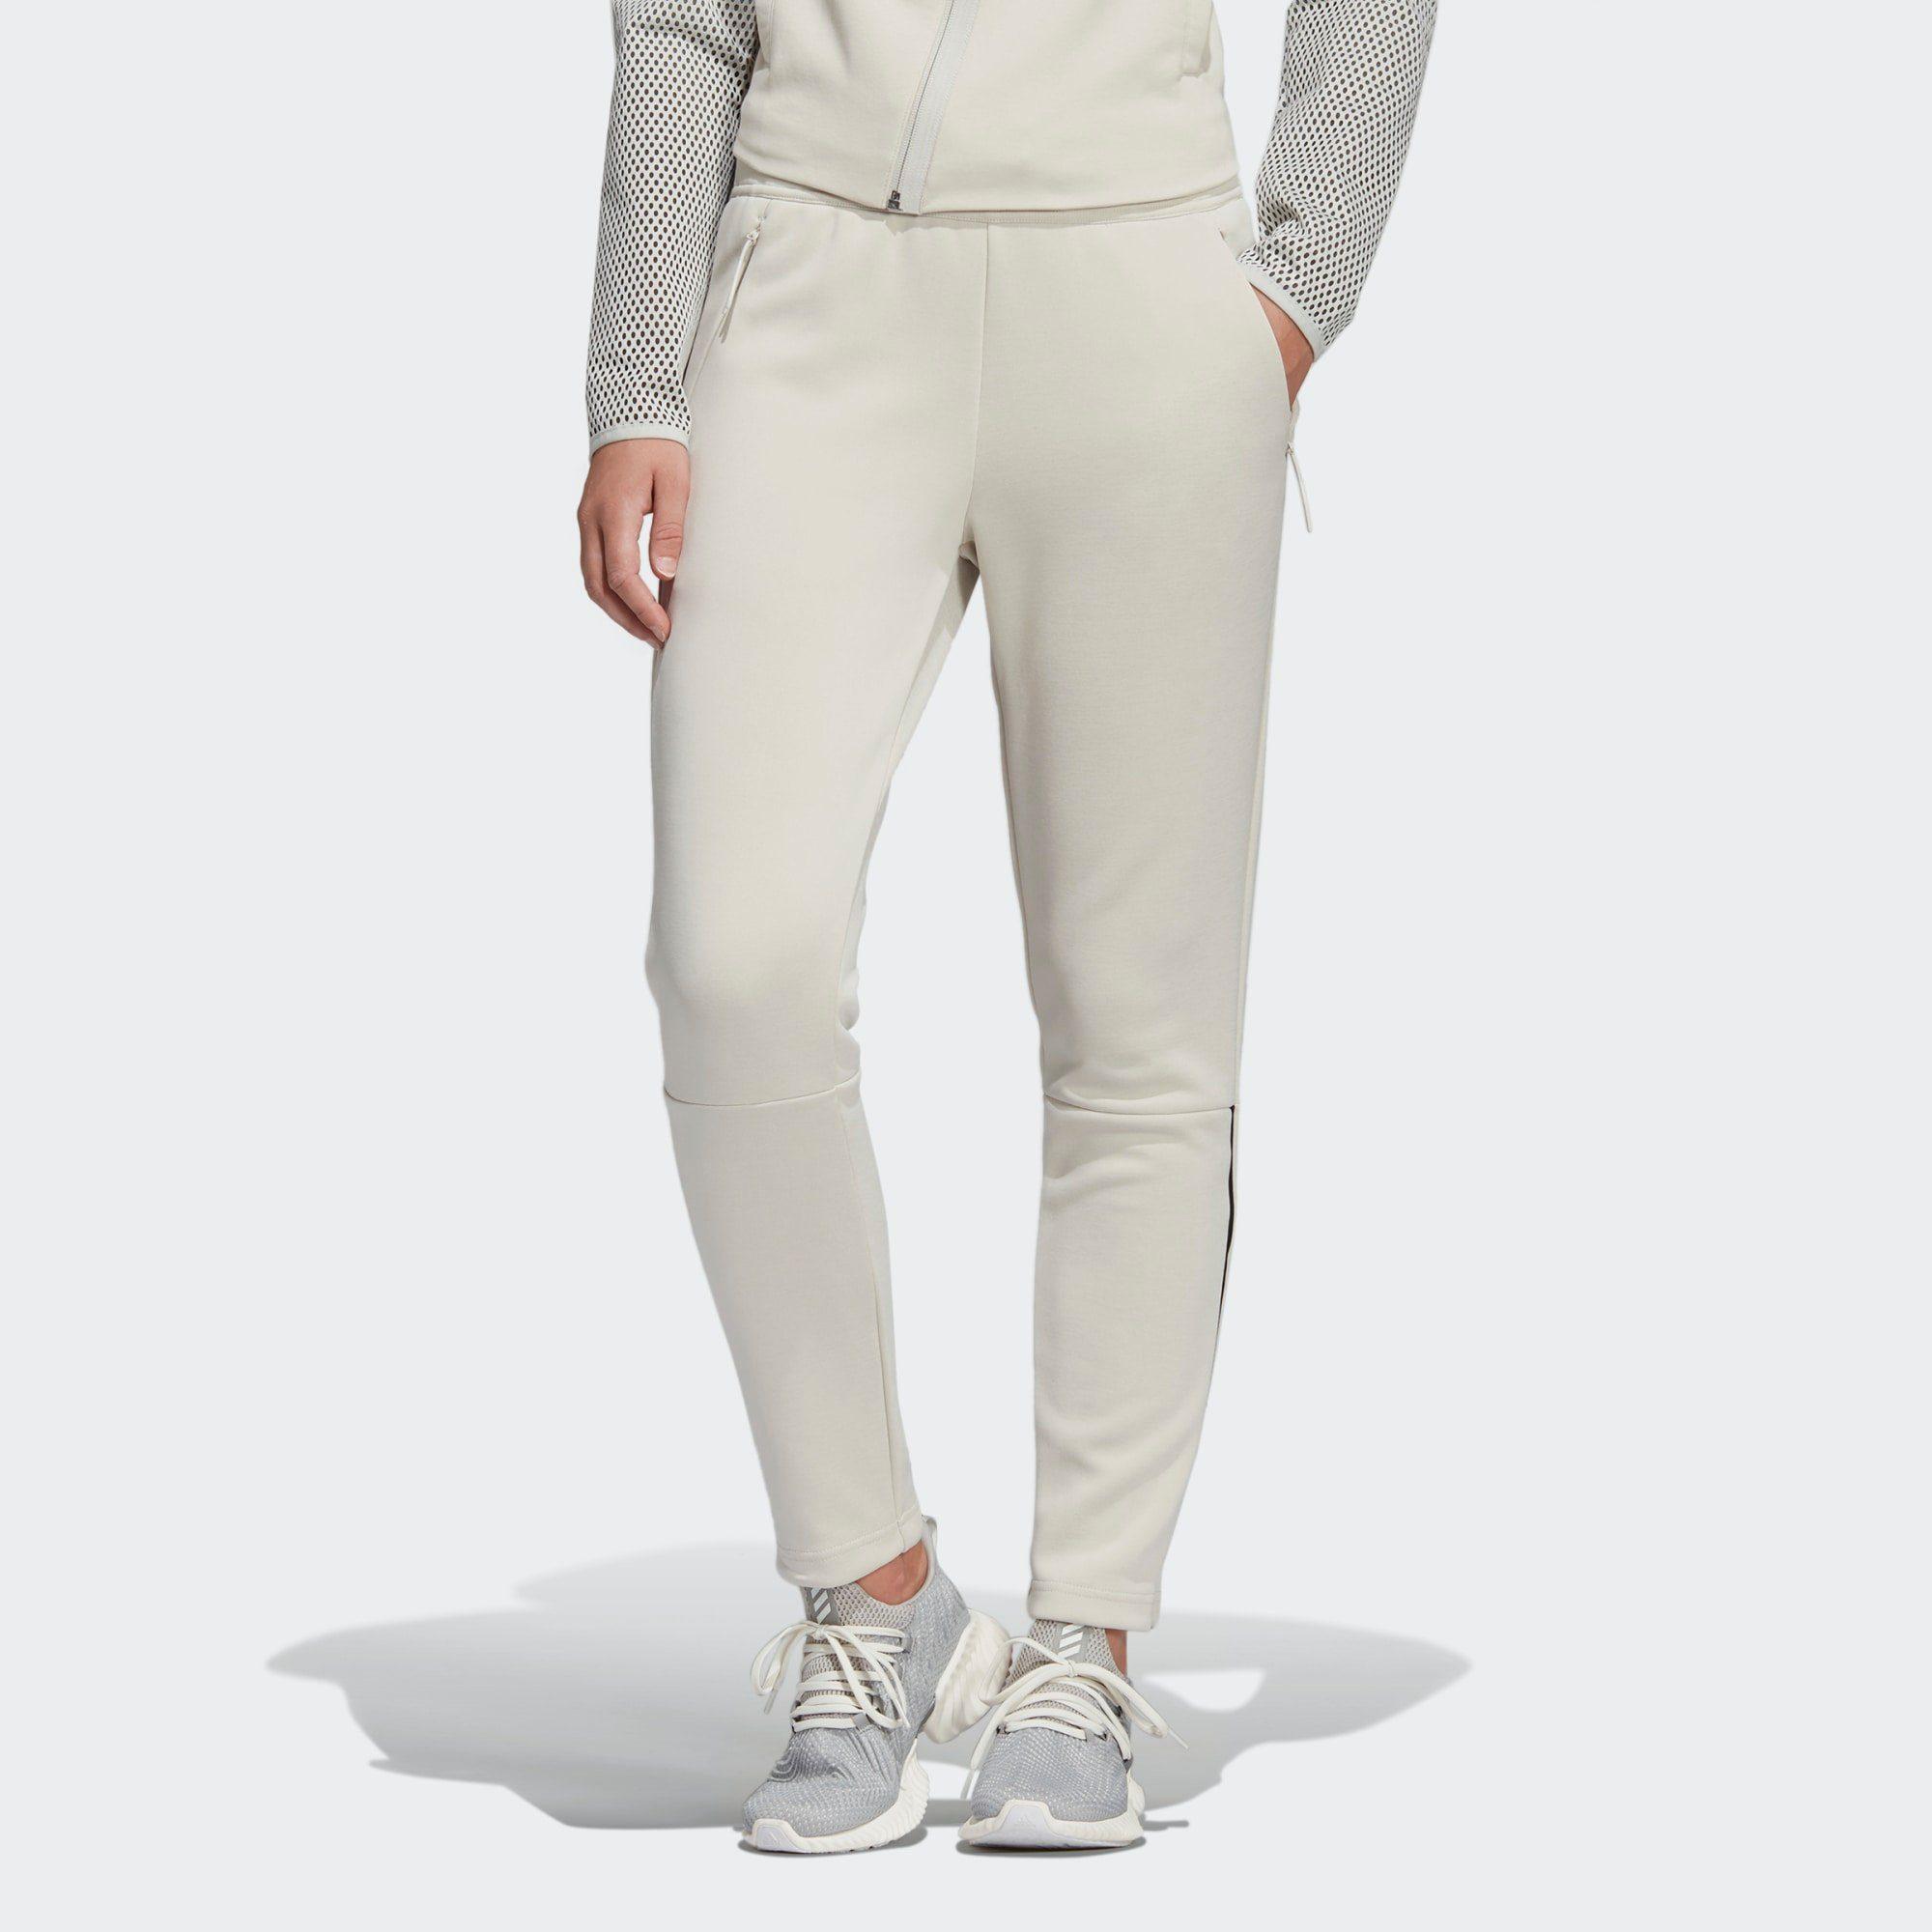 adidas Performance Trekkinghose »adidas Z.N.E. Hose« ZNE online kaufen   OTTO